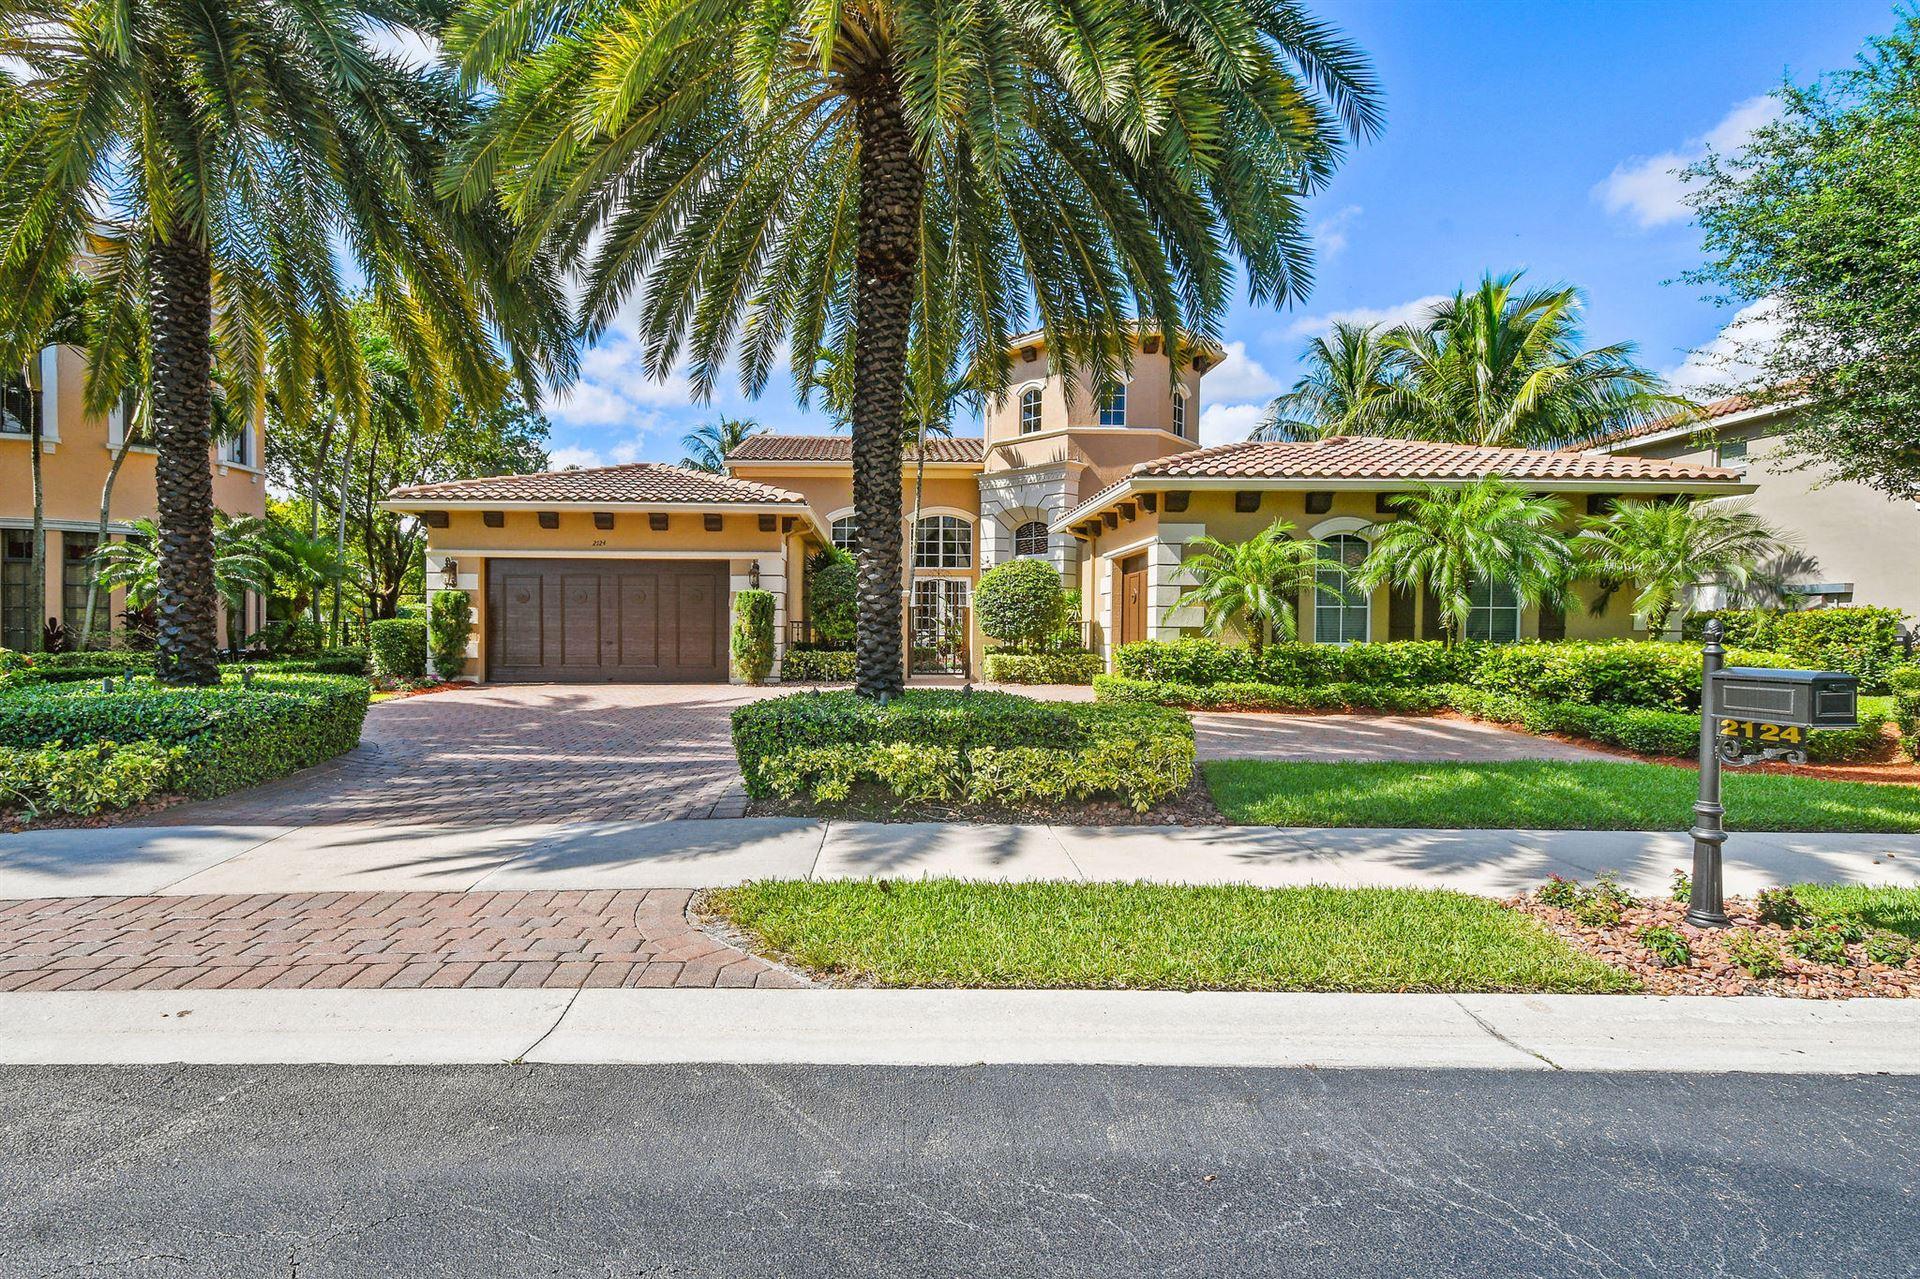 Photo of 2124 Milano Court, Palm Beach Gardens, FL 33418 (MLS # RX-10657608)